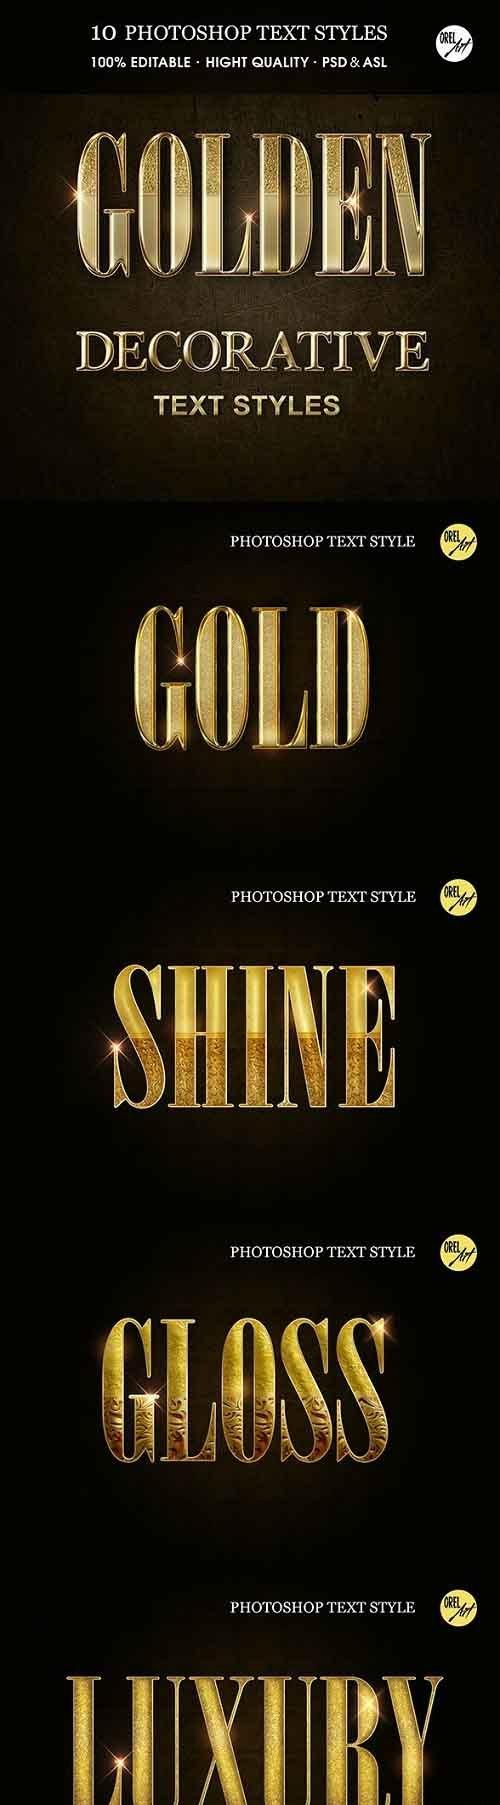 GraphicRiver - Golden Decorative Text Styles 30375826